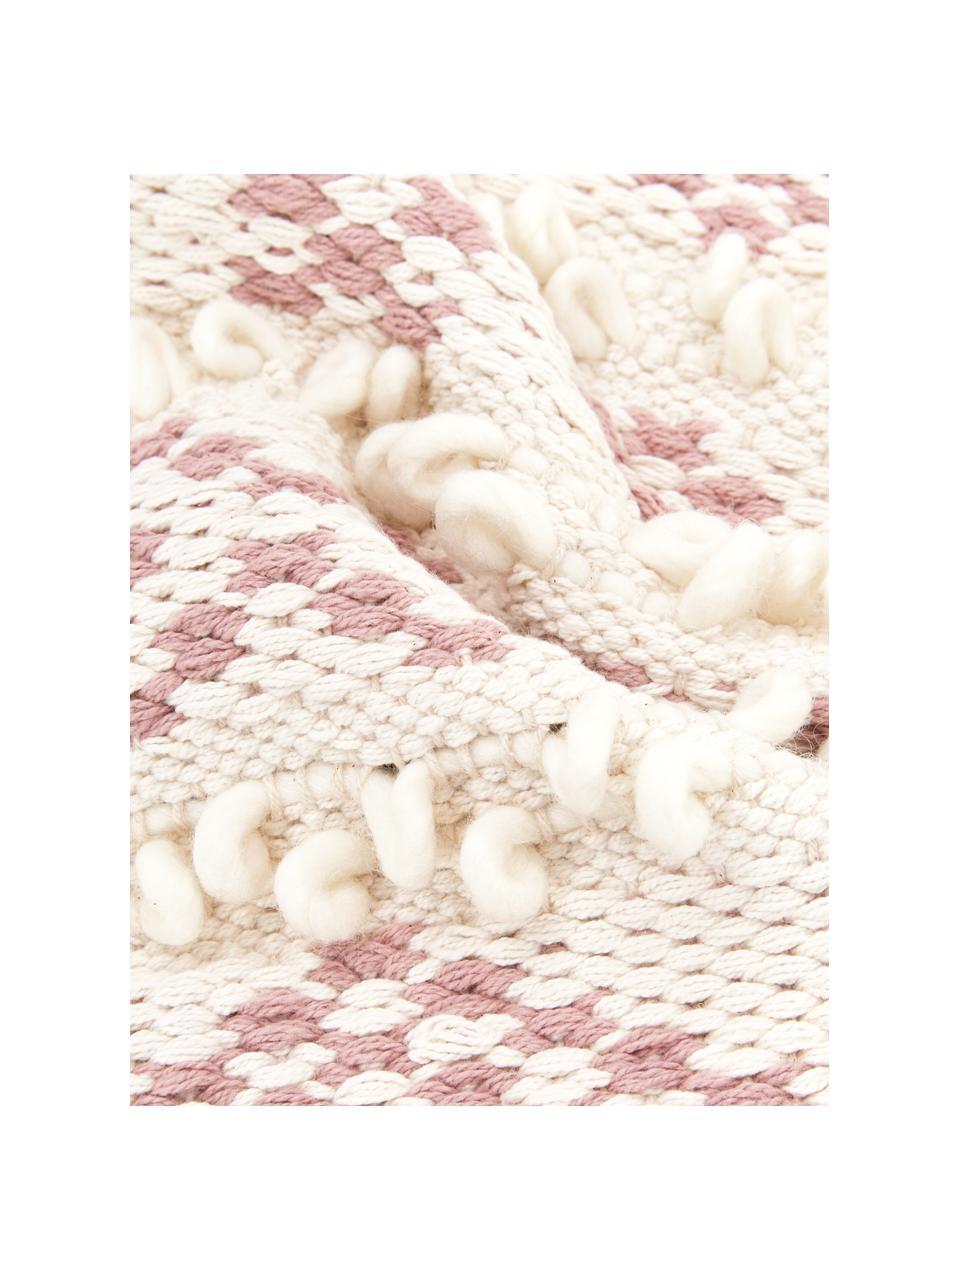 Boho kussenhoes Paco met decoratie, 80% katoen, 20% wol, Wit, roze, 45 x 45 cm